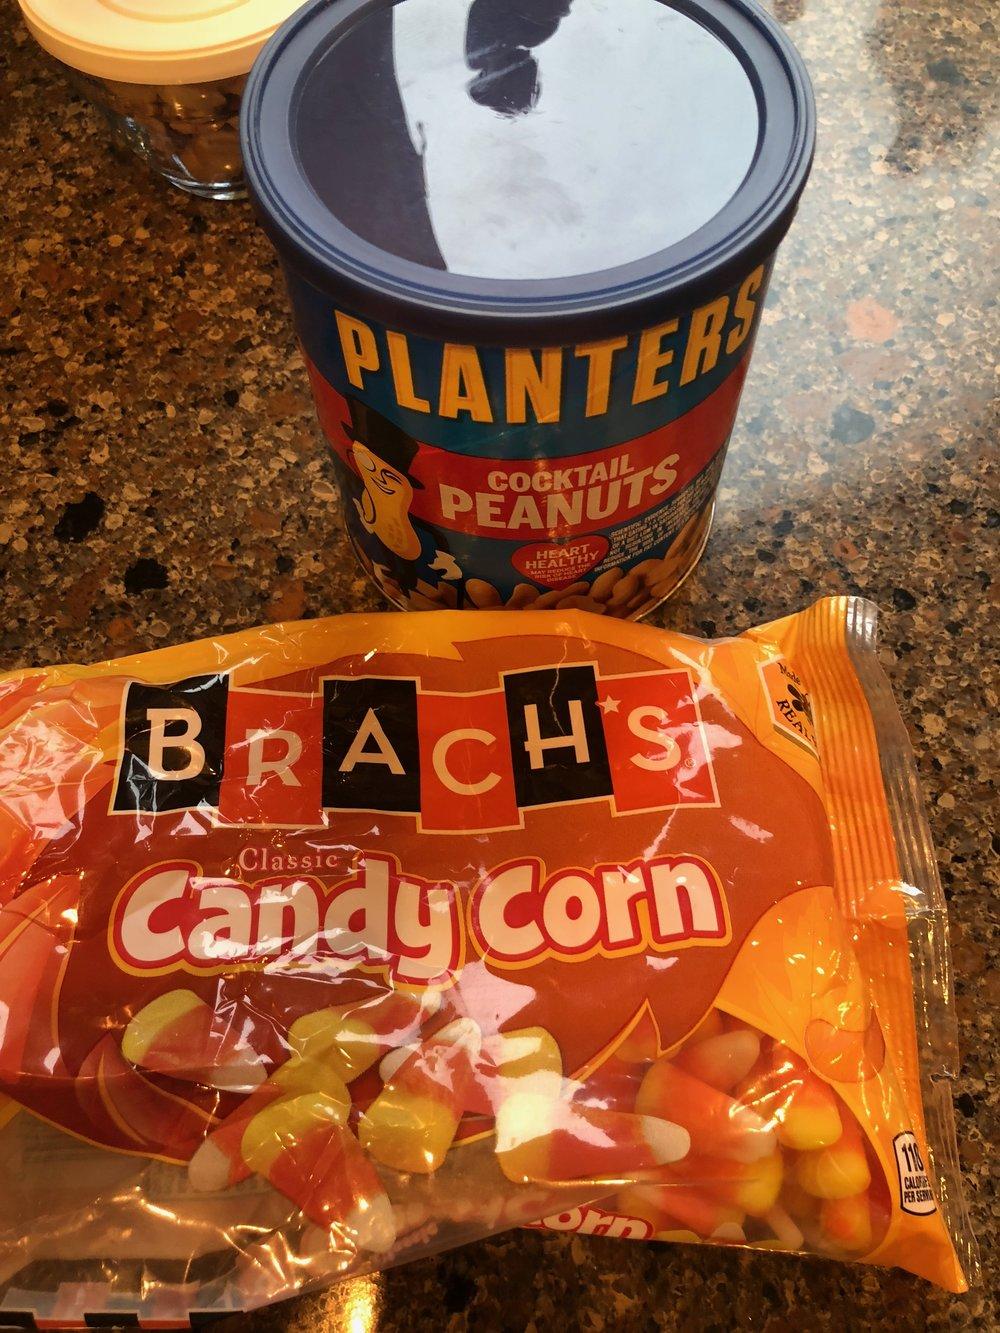 Peanuts + Candy Corn